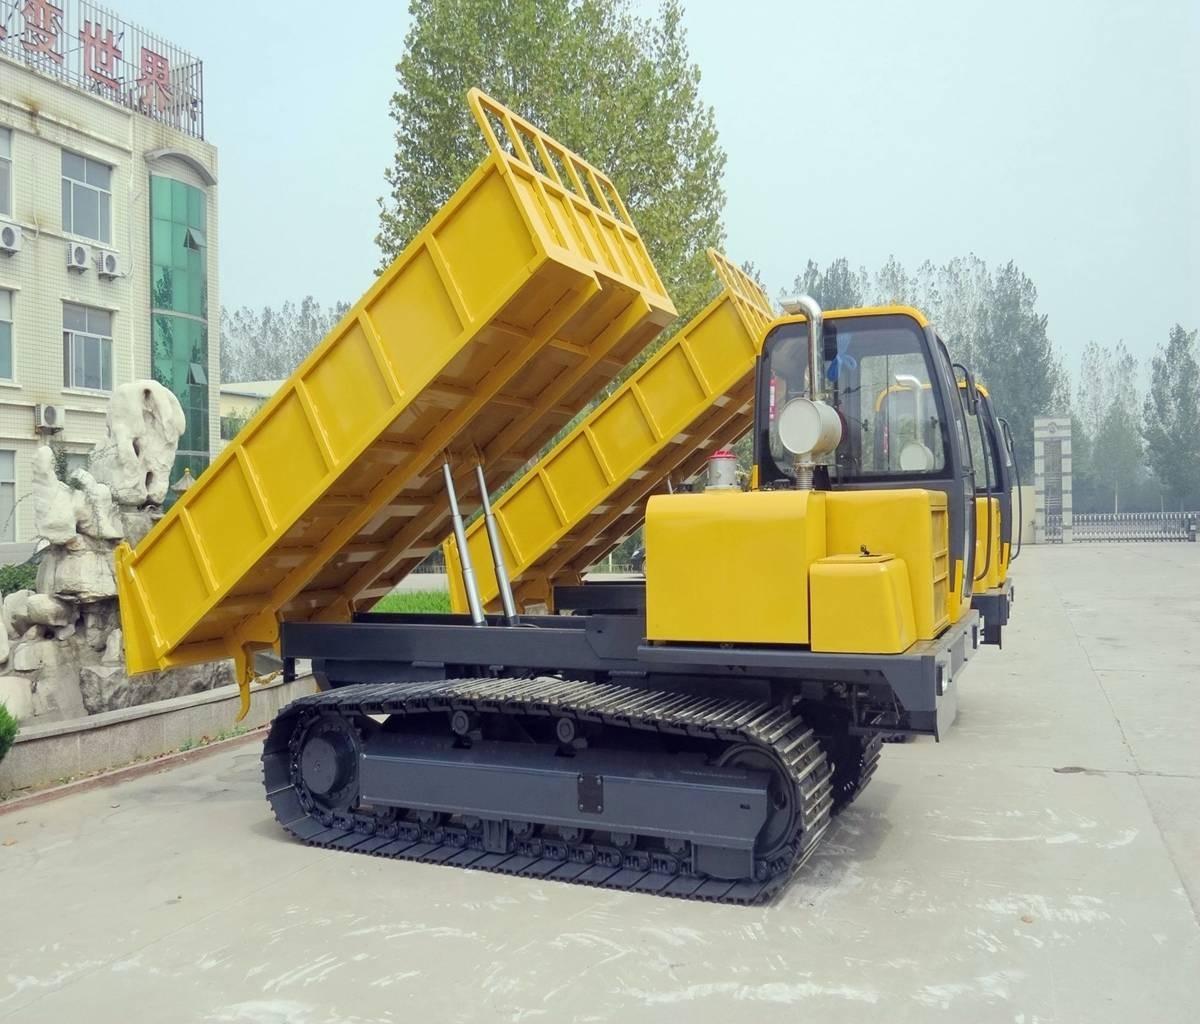 Sales Crawler Dumper Truck, Buy Crawler Dumper Truck, Crawler Dumper Truck Factory, Crawler Dumper Truck Brands